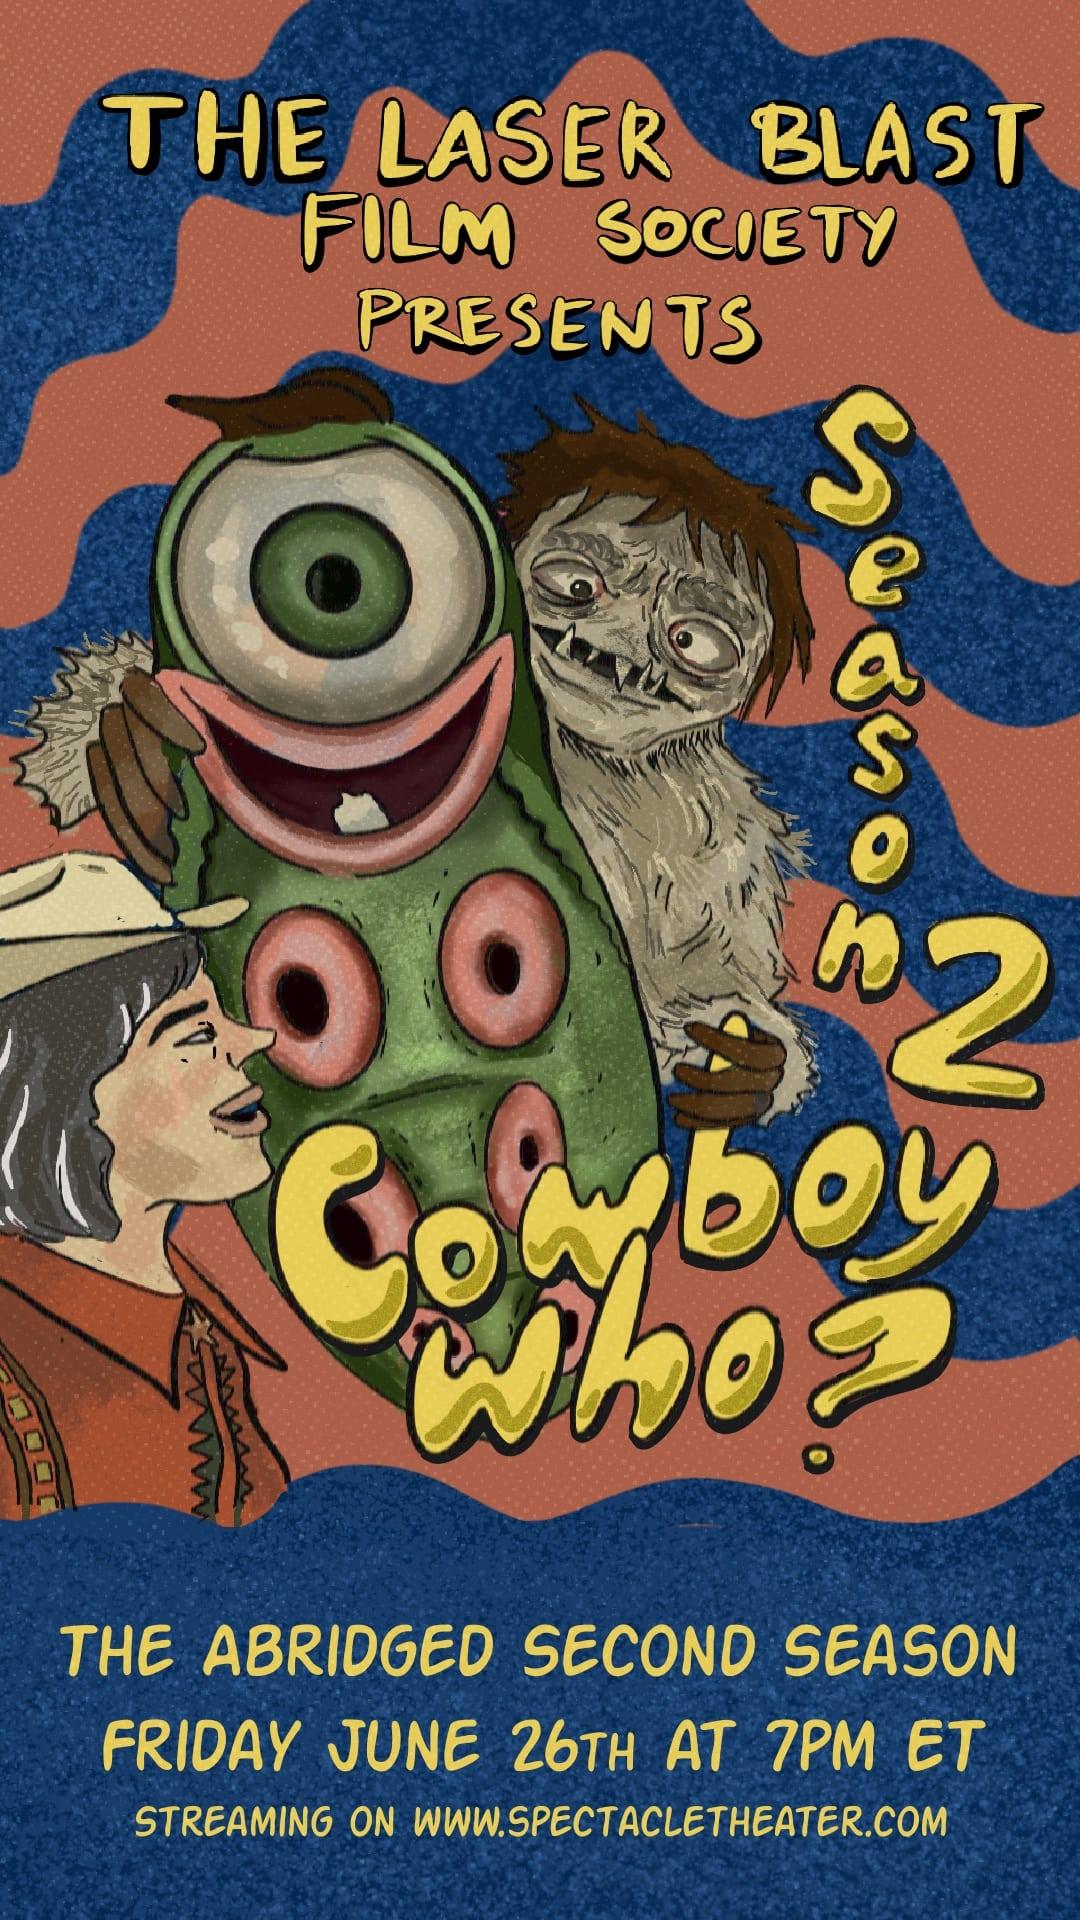 Cowboy Who S2 Poster V2